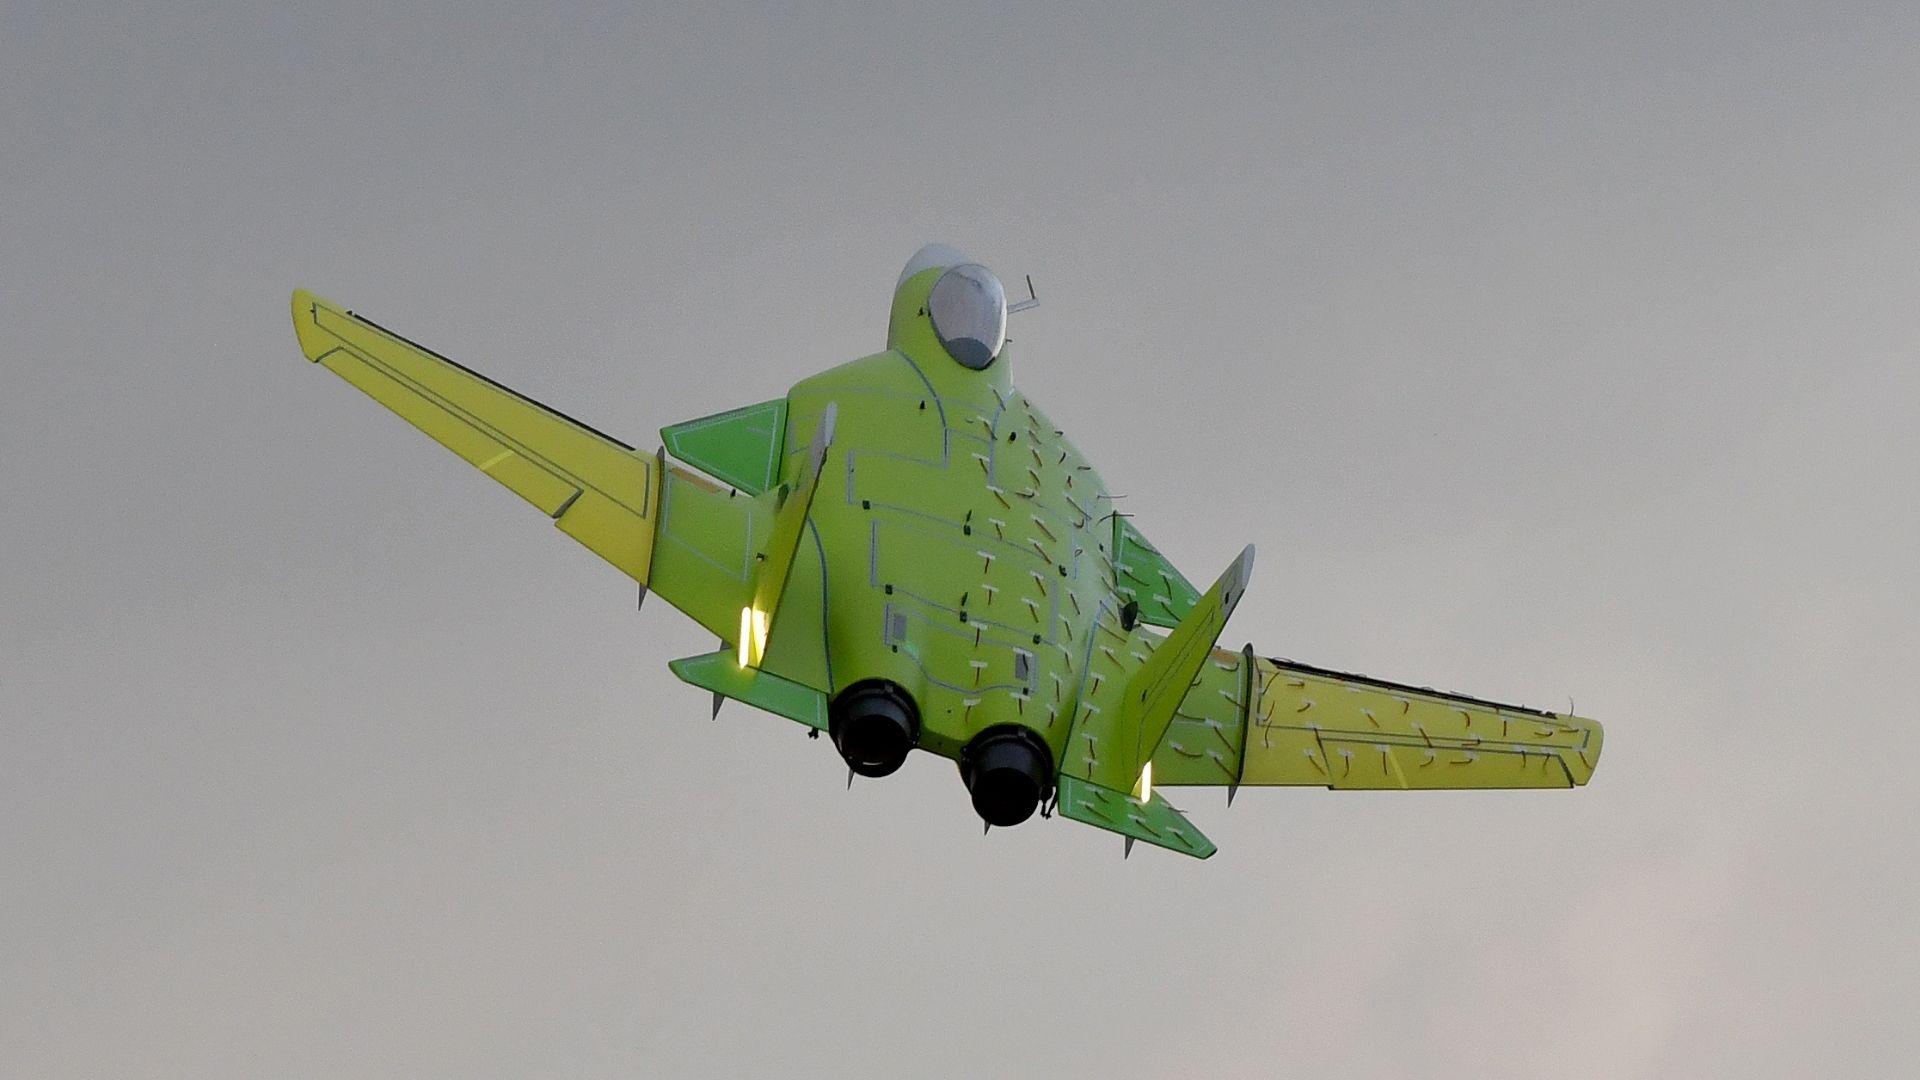 Su-X air flow by Rene Rosentraeger